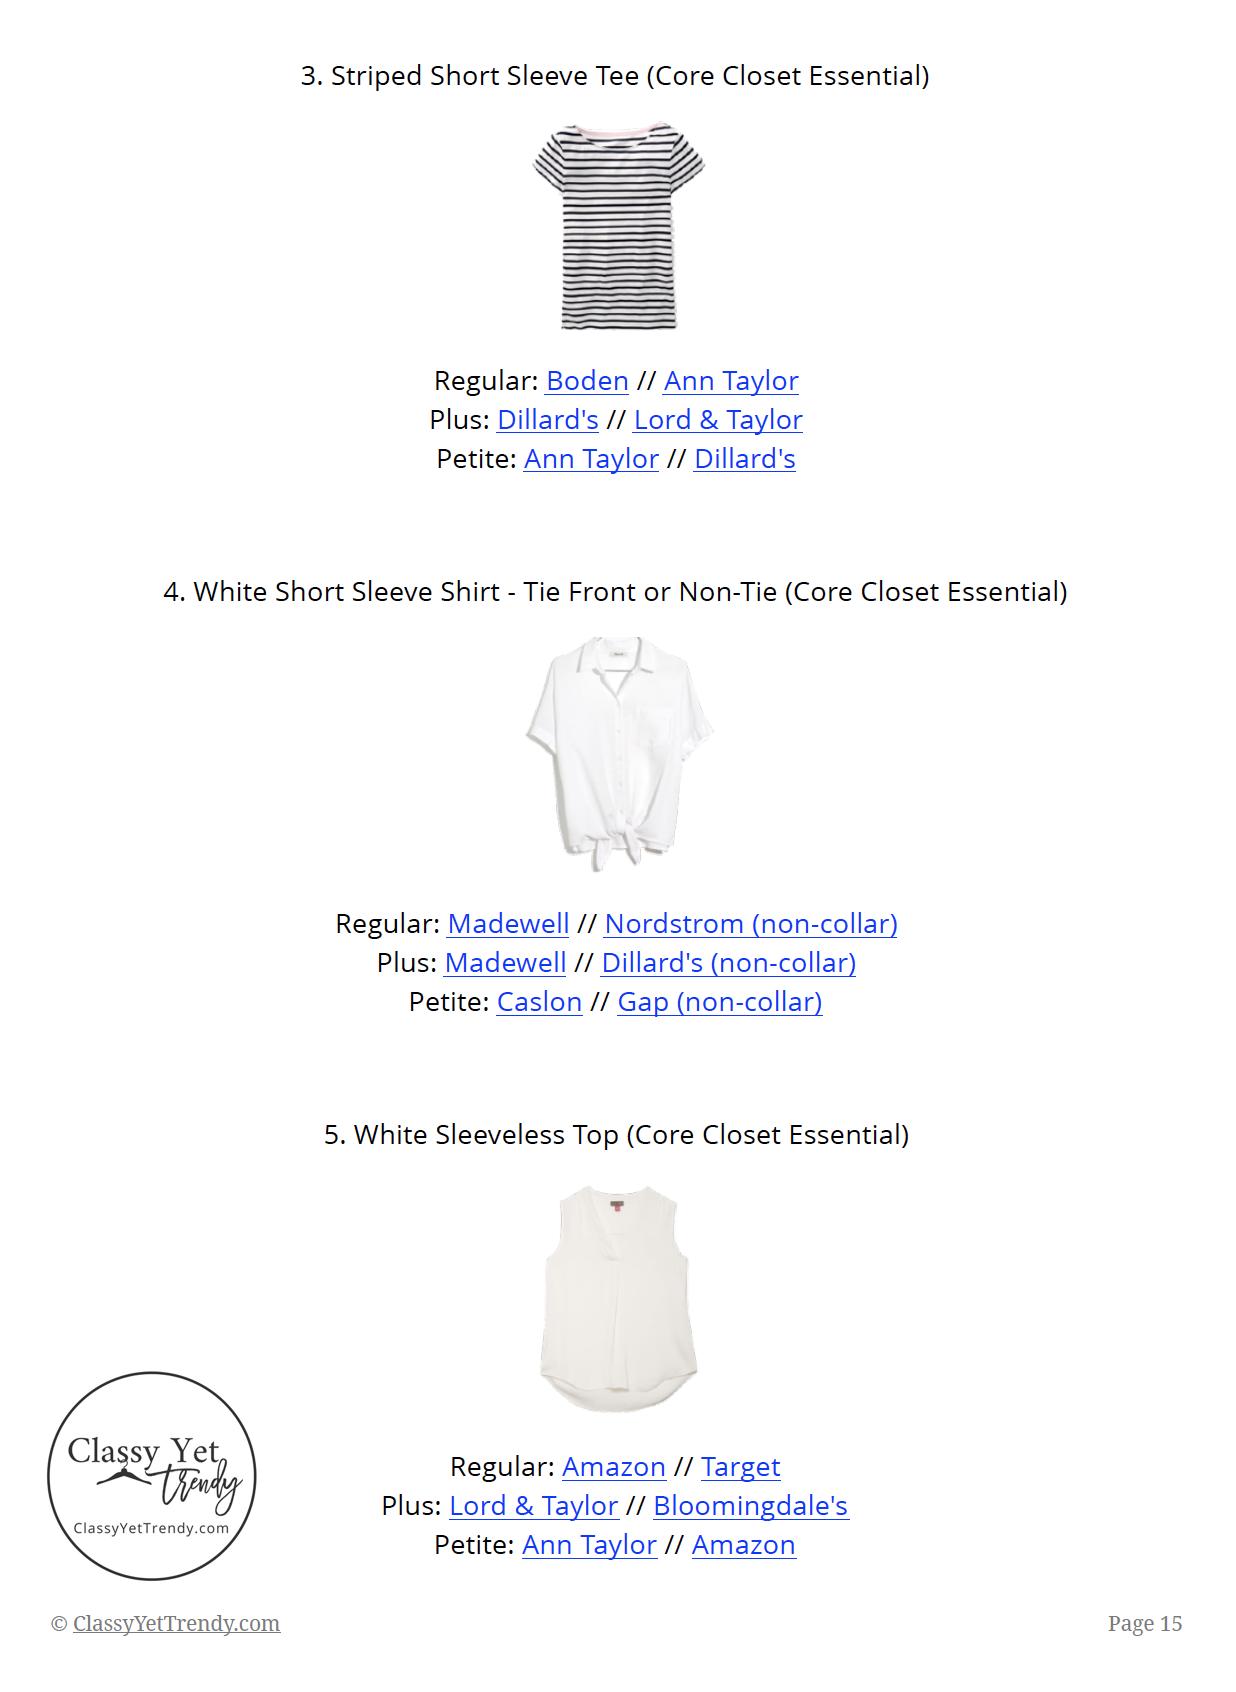 French Minimalist Capsule Wardrobe Summer 2019 - page 15